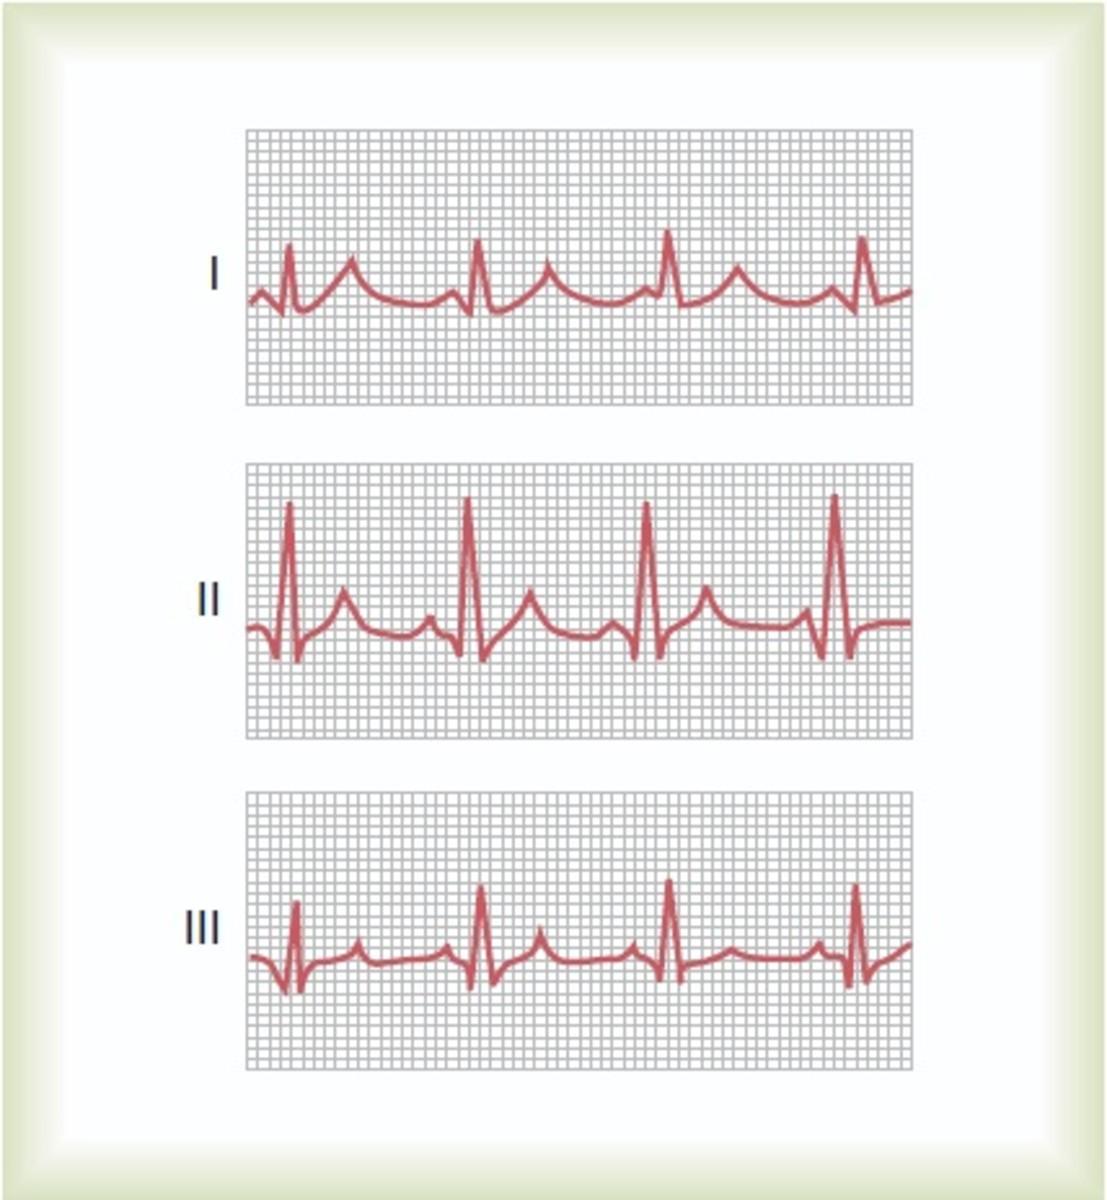 Normal ECG in 3 bipolar limb leads